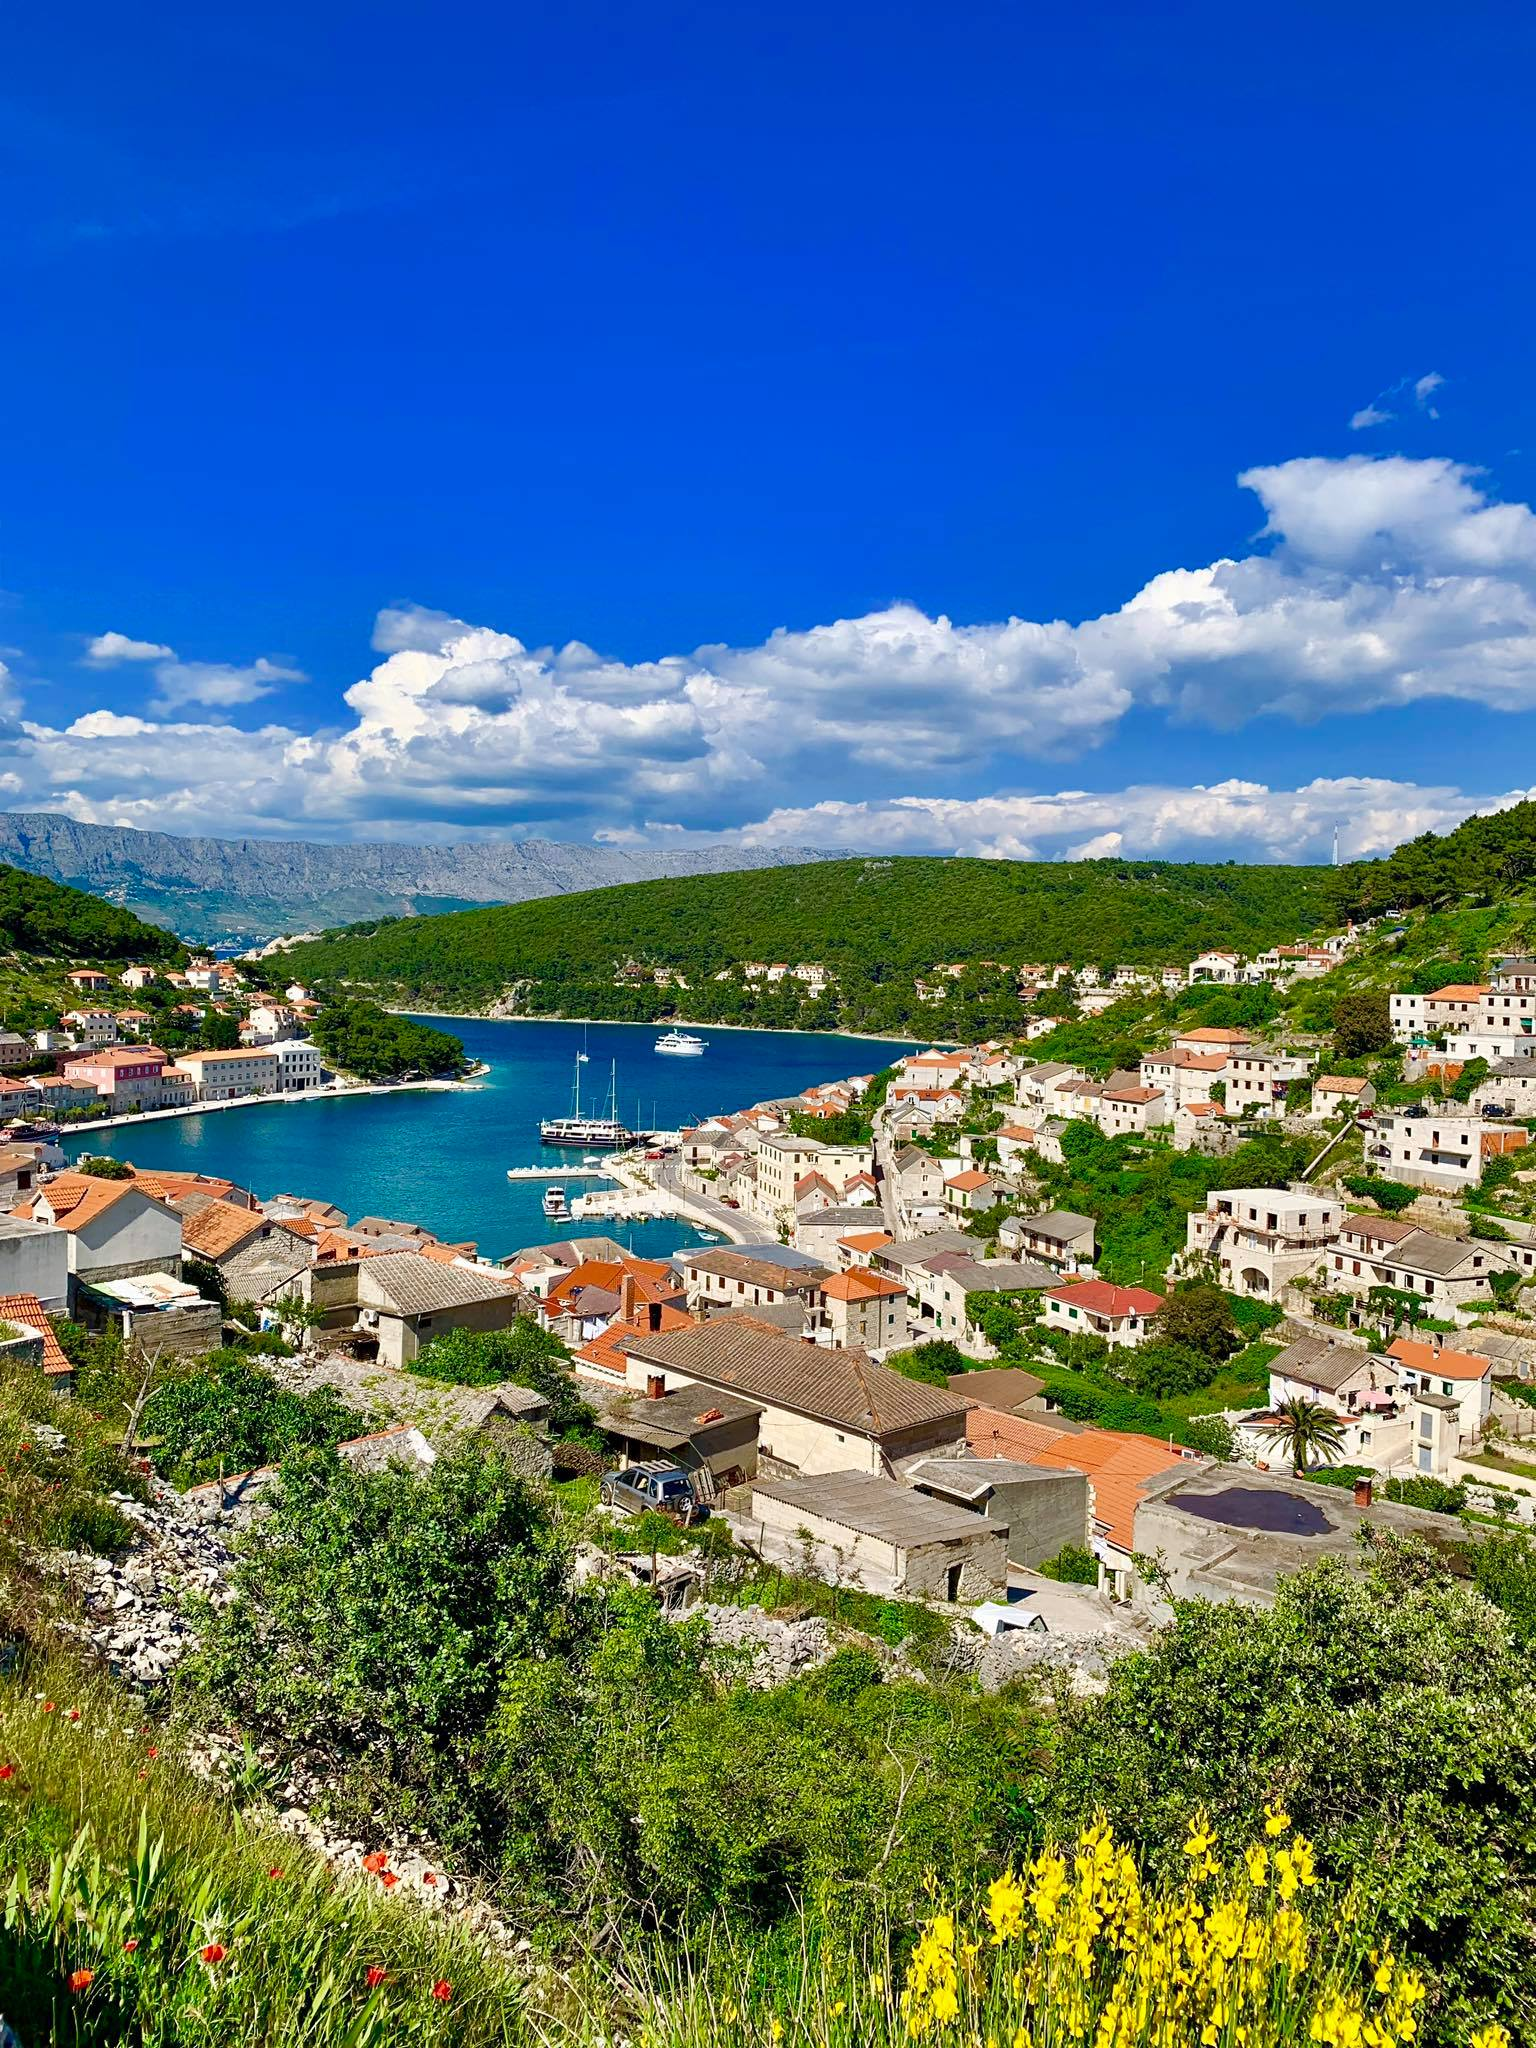 A Travel Guide To Island Brac, Croatia2